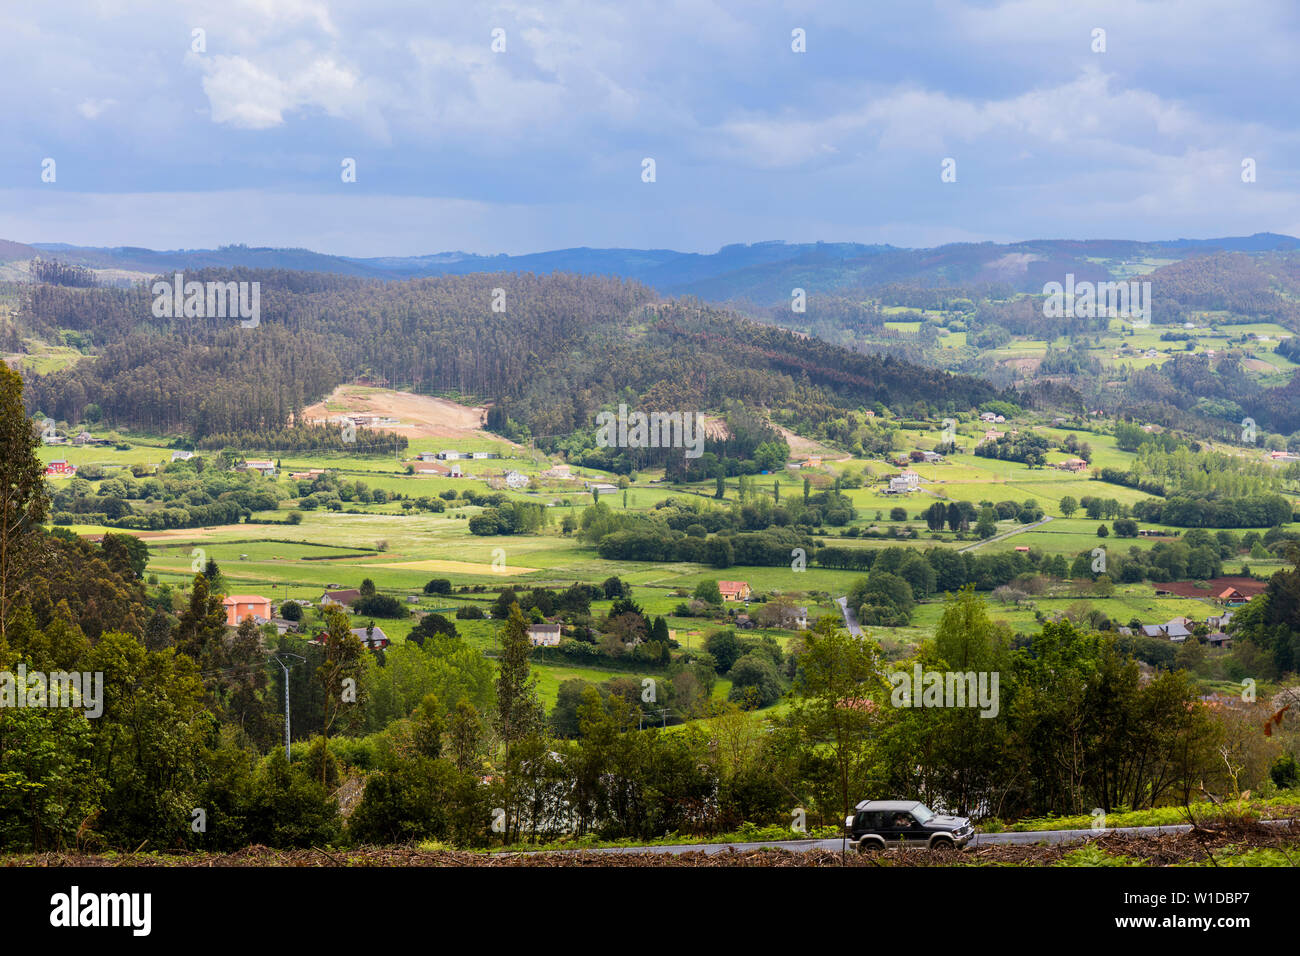 Verde típico paisaje gallego cerca de San Sadurnino, provincia de A Coruña, Galicia, España Foto de stock